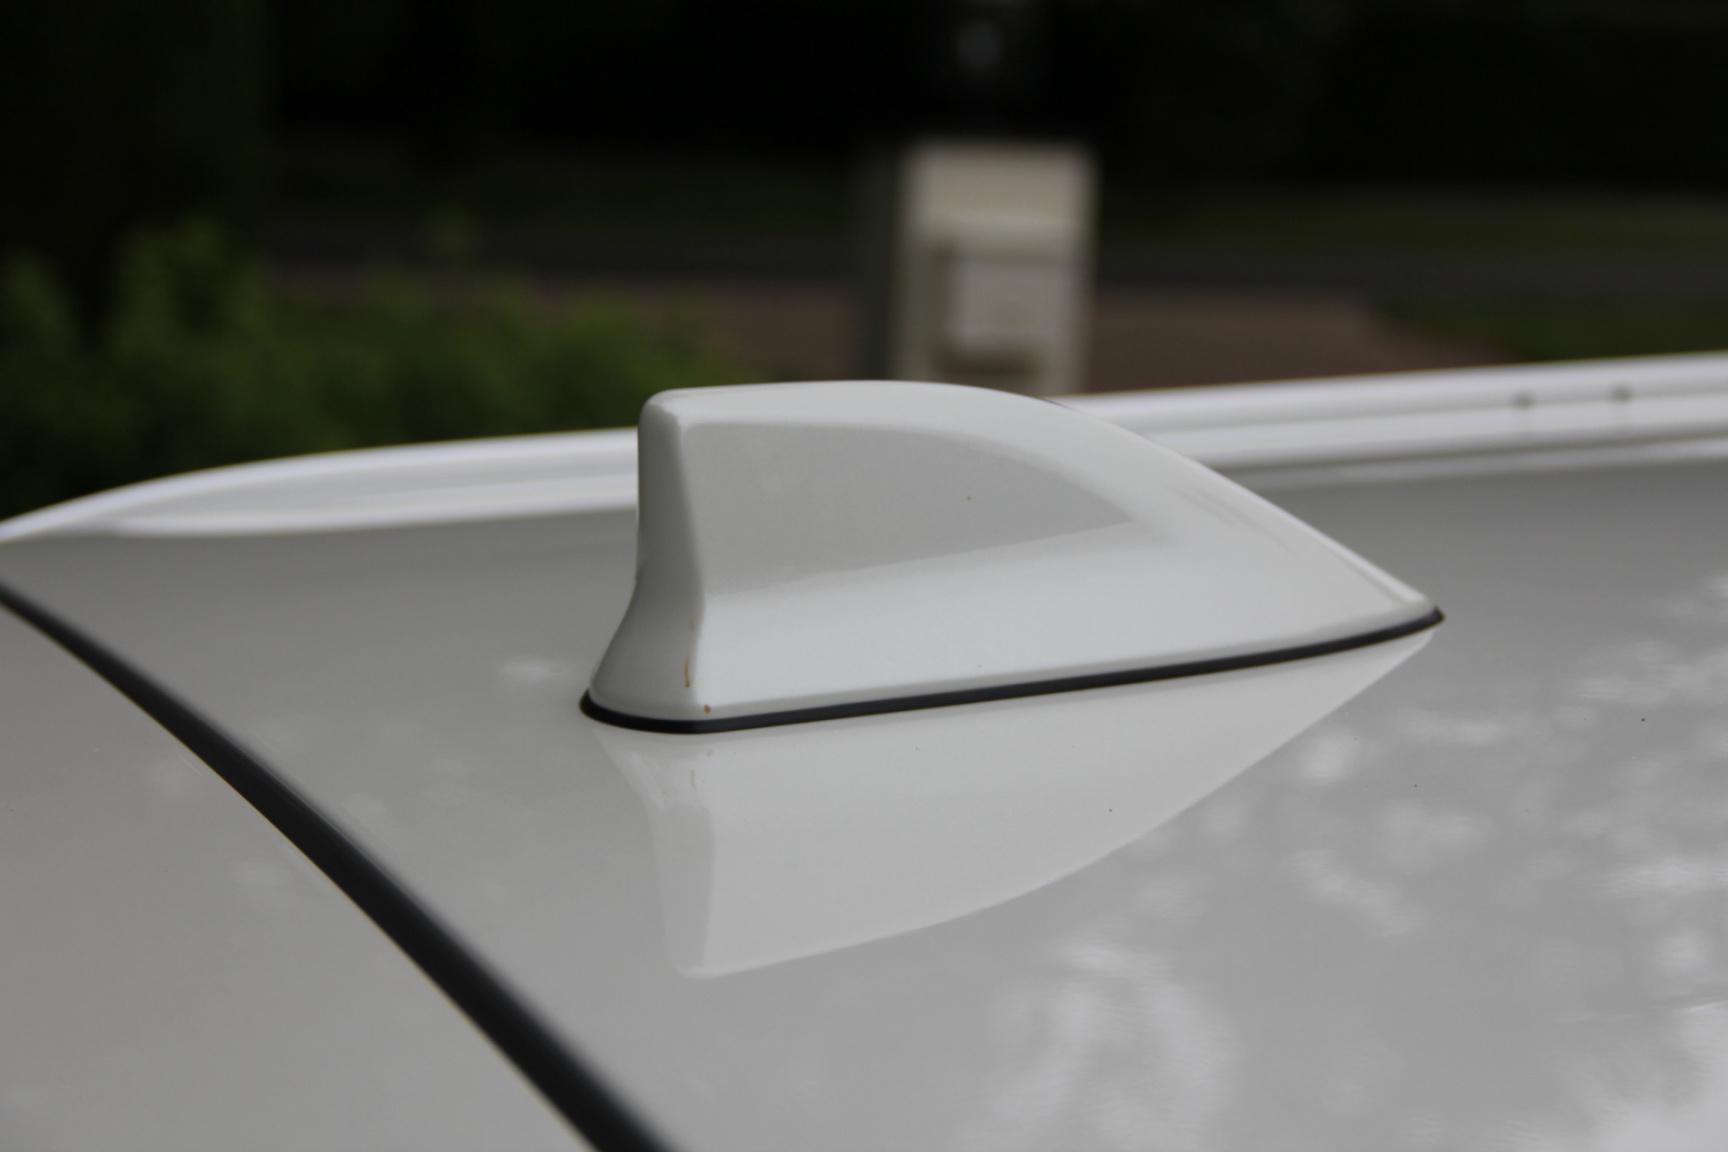 Suzuki-Swace-15